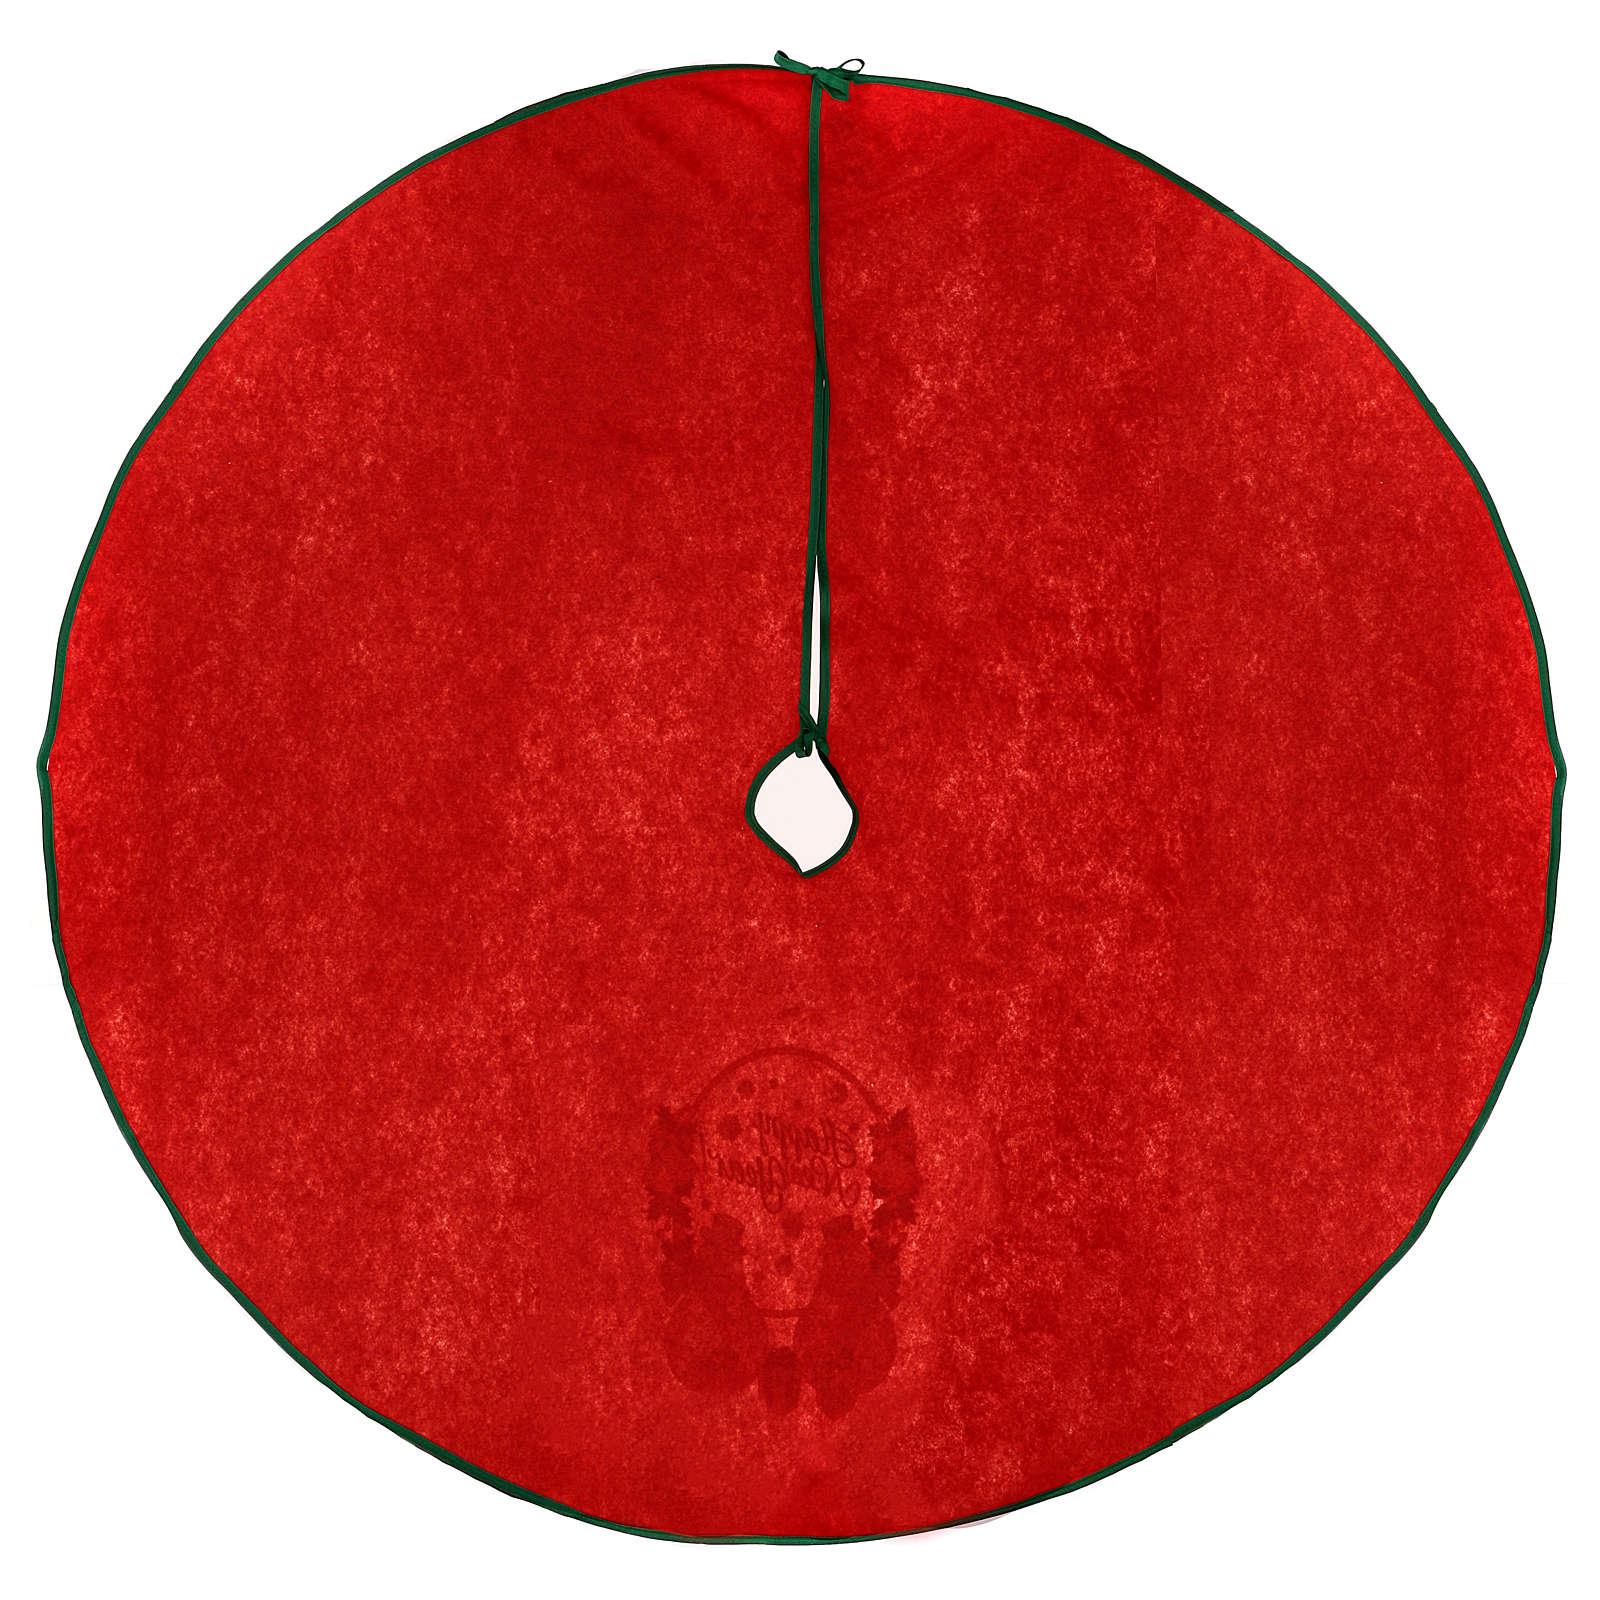 Cache-pied sapin de Noël rouge Happy New Year 120 cm 3